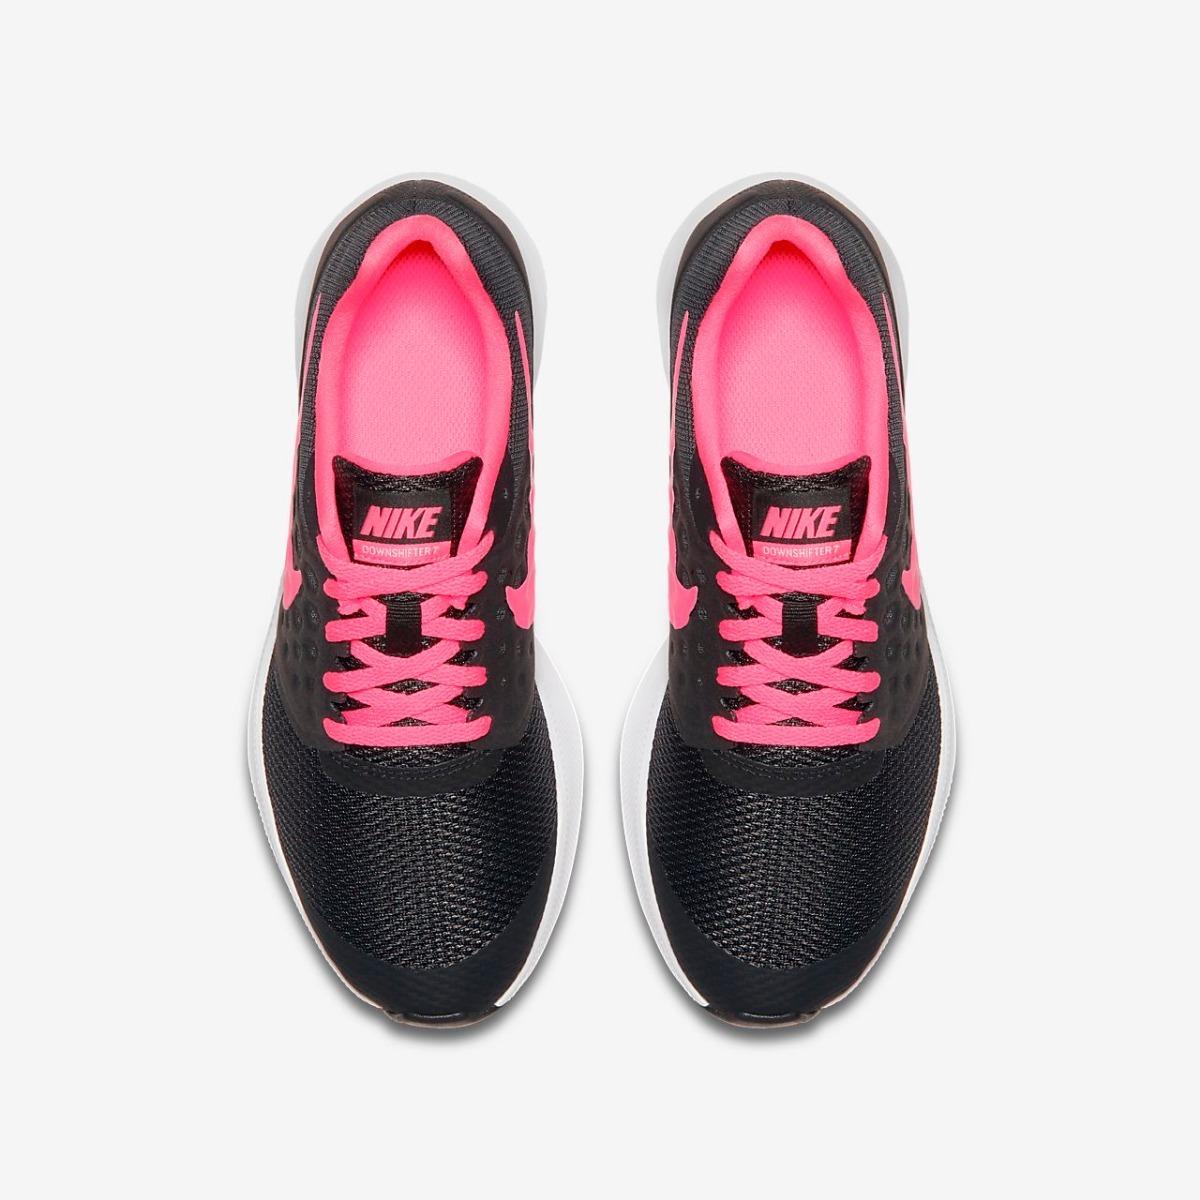 a17f6f5efe951 tenis nike downshifter 7 mujer gym correr running gimnasio. Cargando zoom.